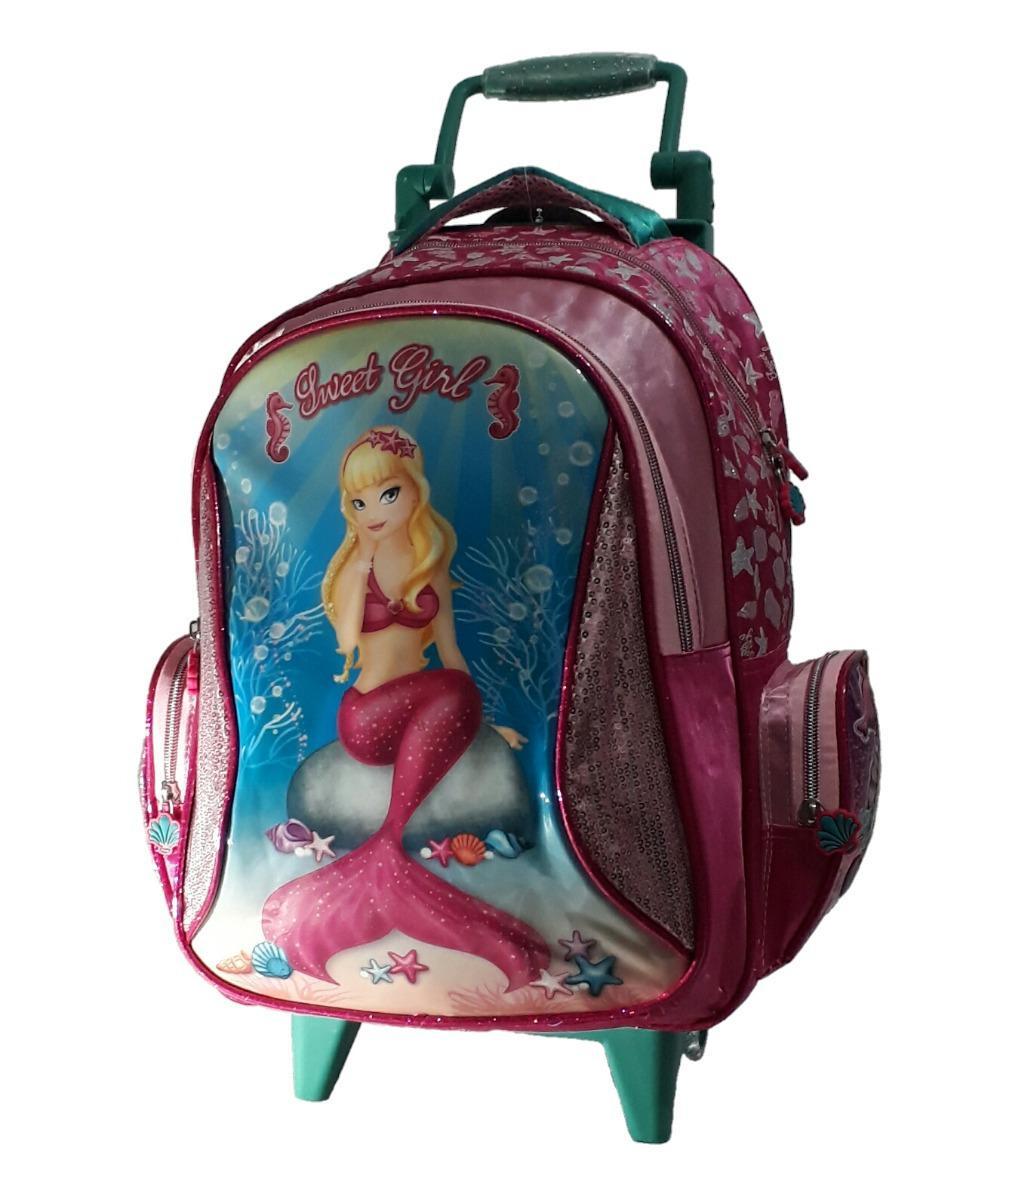 fb72a46dd Mochila Rodinha Infantil Feminina Sweet Girl Sereia Rosa - Santino R$ 89,90  à vista. Adicionar à sacola